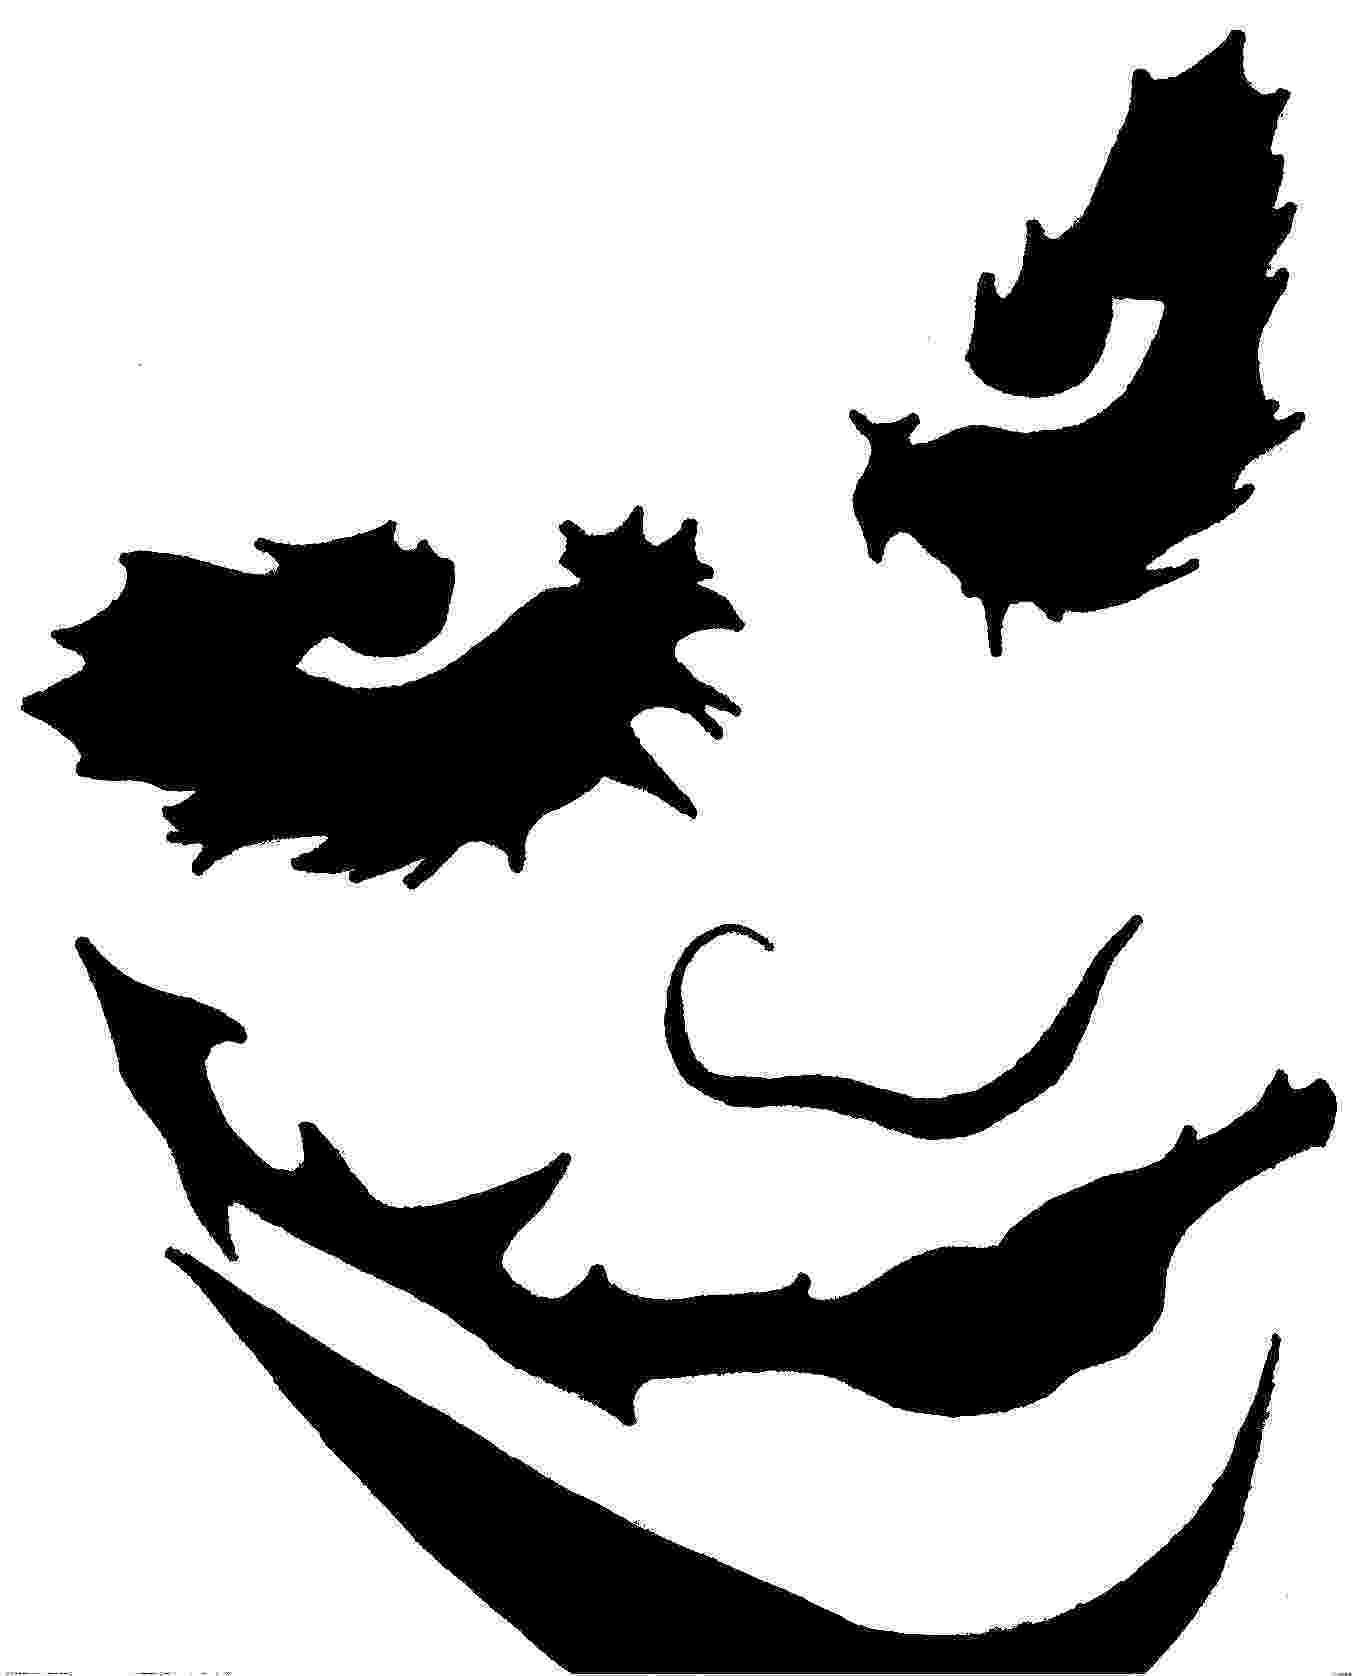 batman emblem printable outline batman logo coloring page supportive guru printable batman emblem